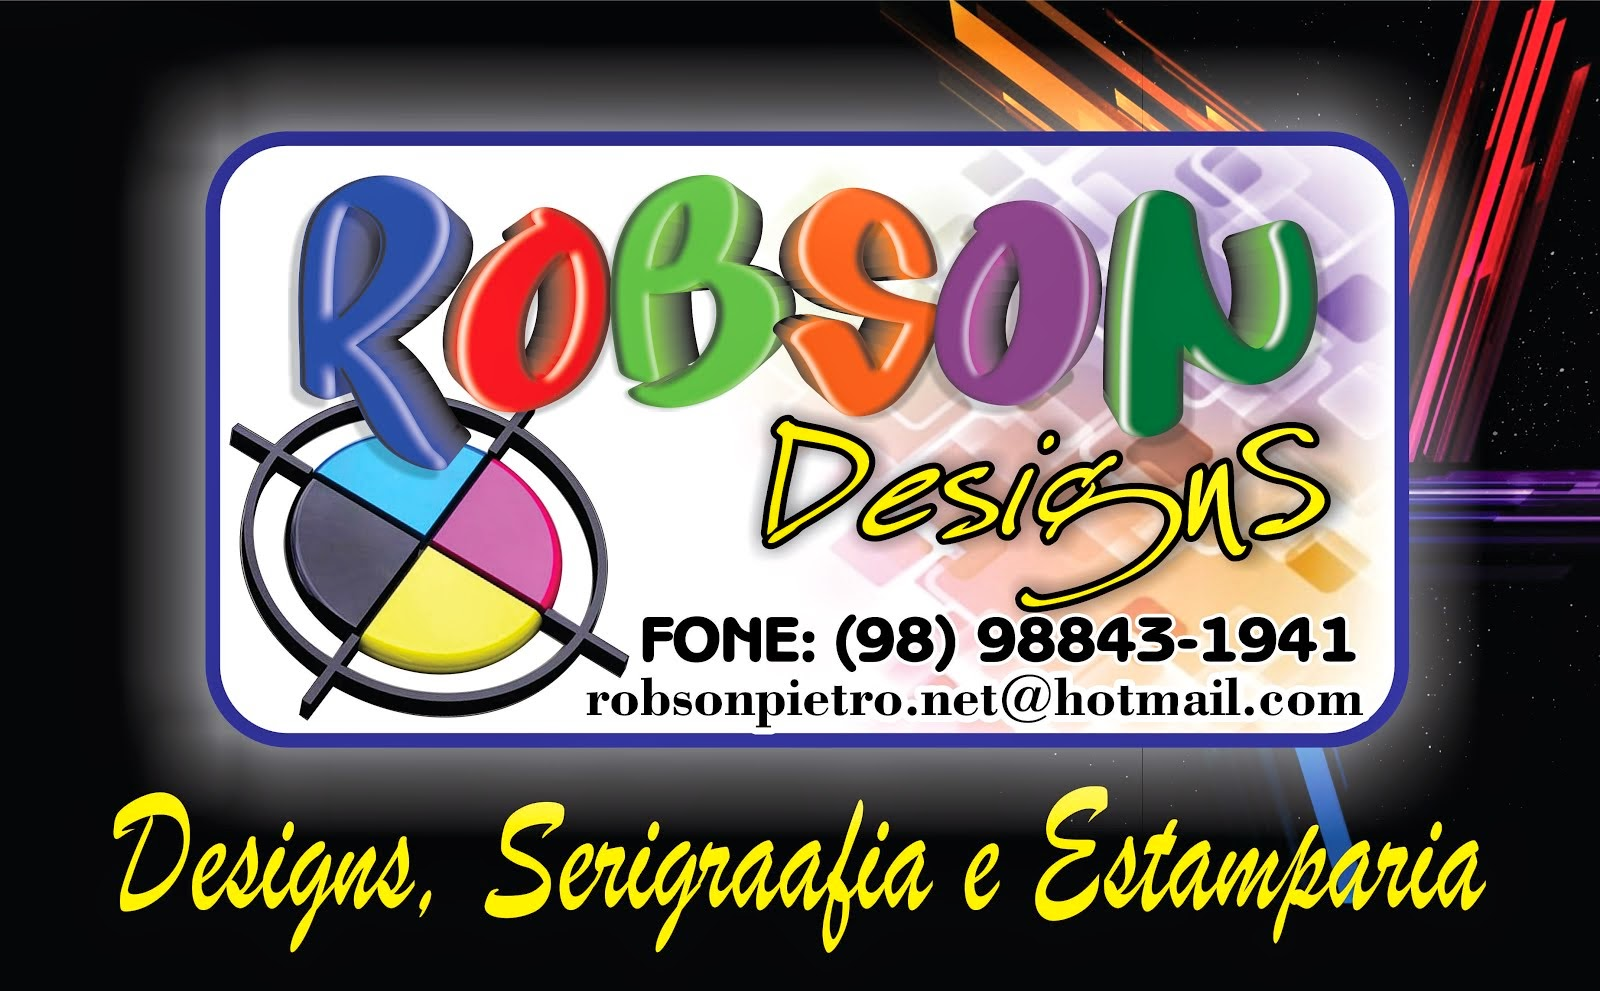 ROBSON DESIGNS!!!